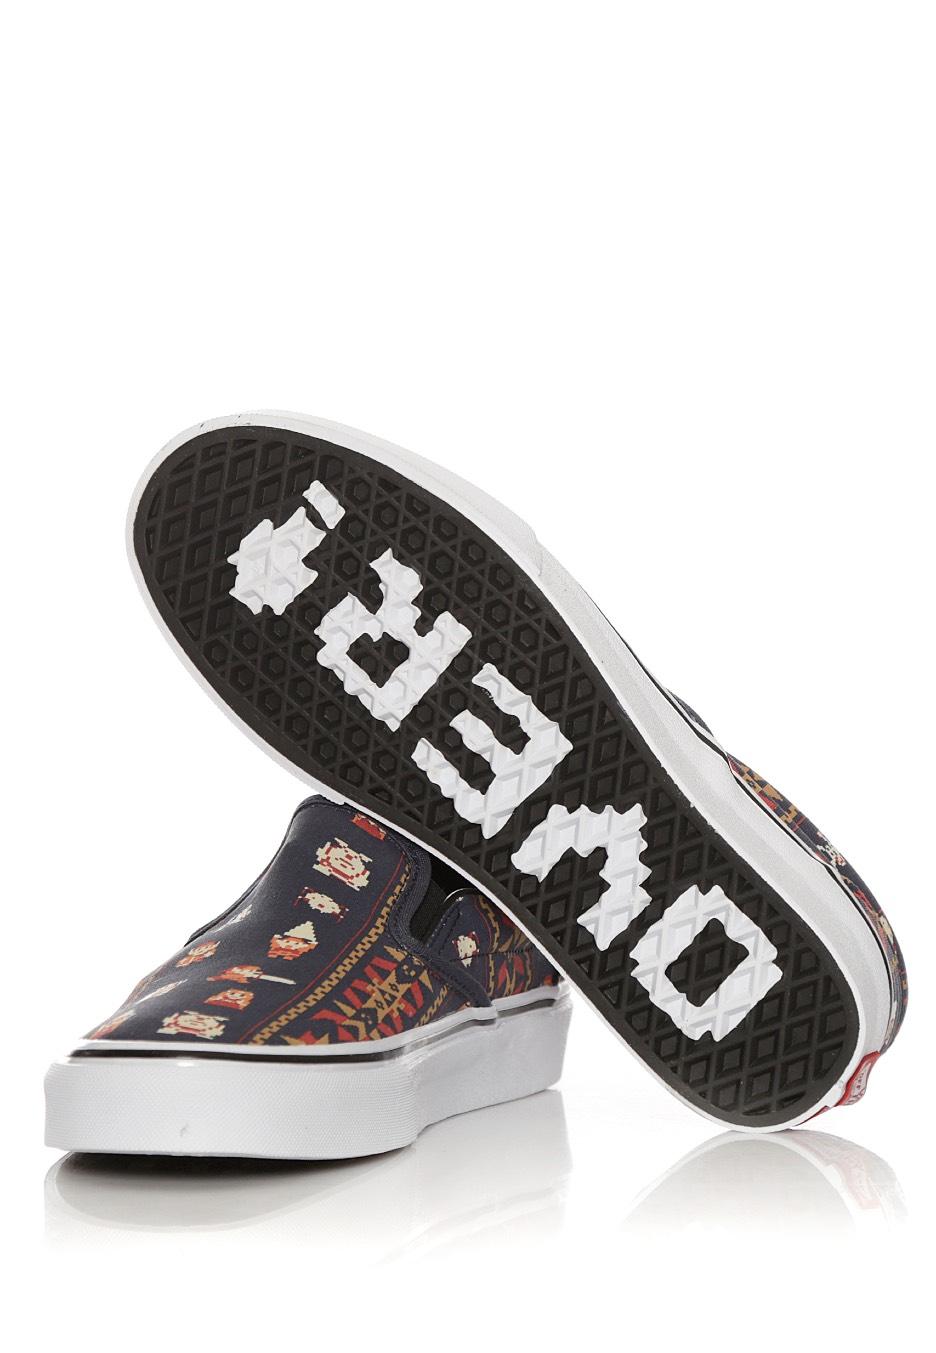 a87565c2b3 ... Vans X Nintendo - Classic Slip-On Nintendo Zelda Parisian Night - Girl  Shoes ...